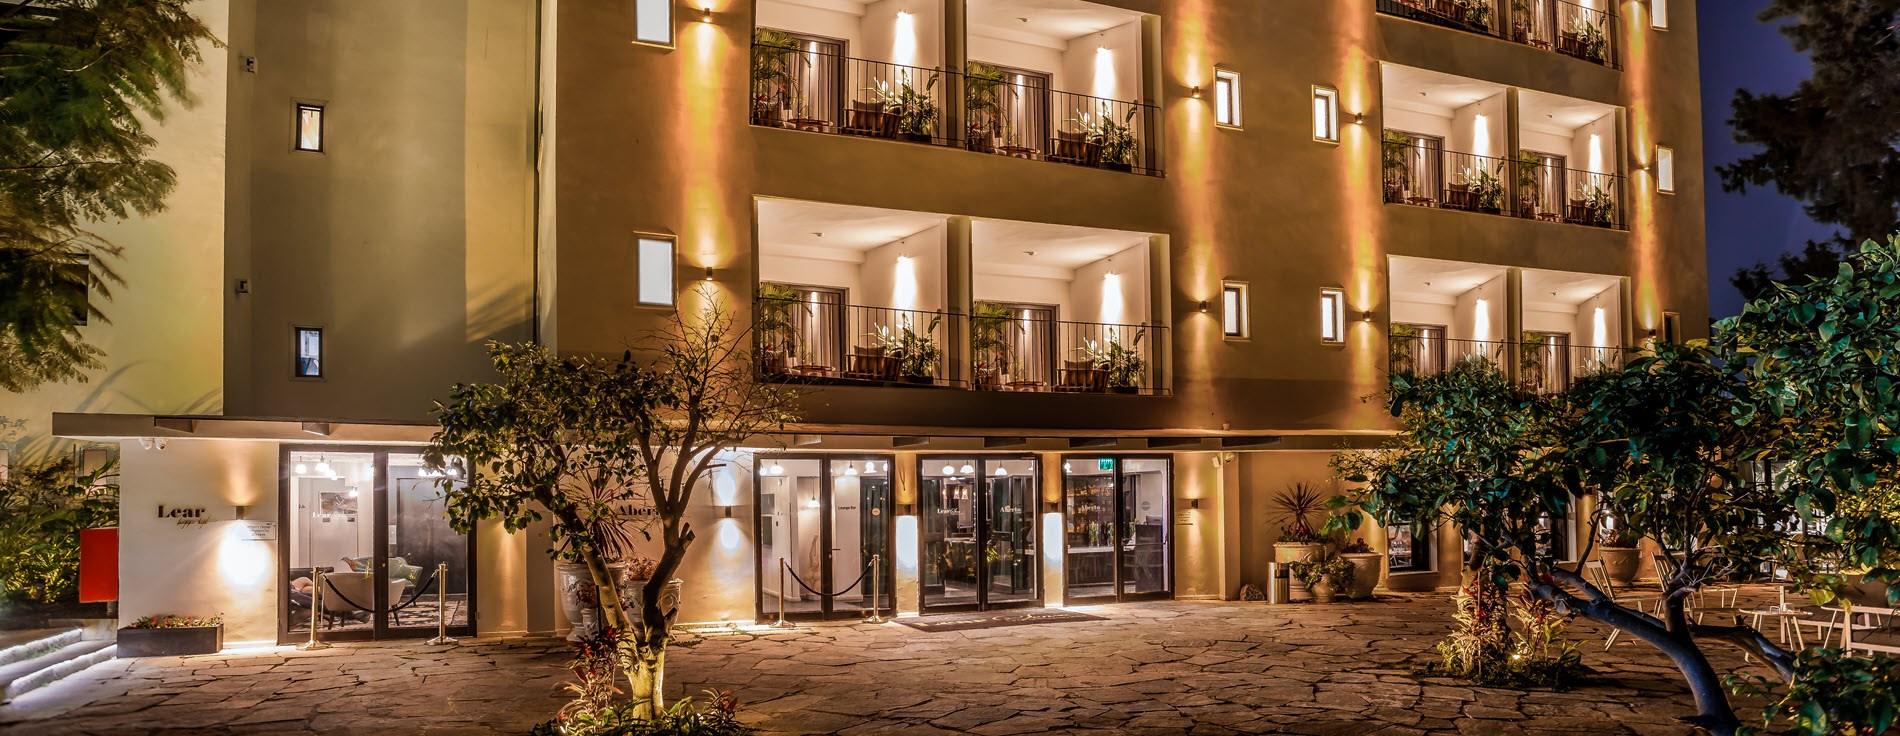 Lear Sense Boutique Hotel Gedera